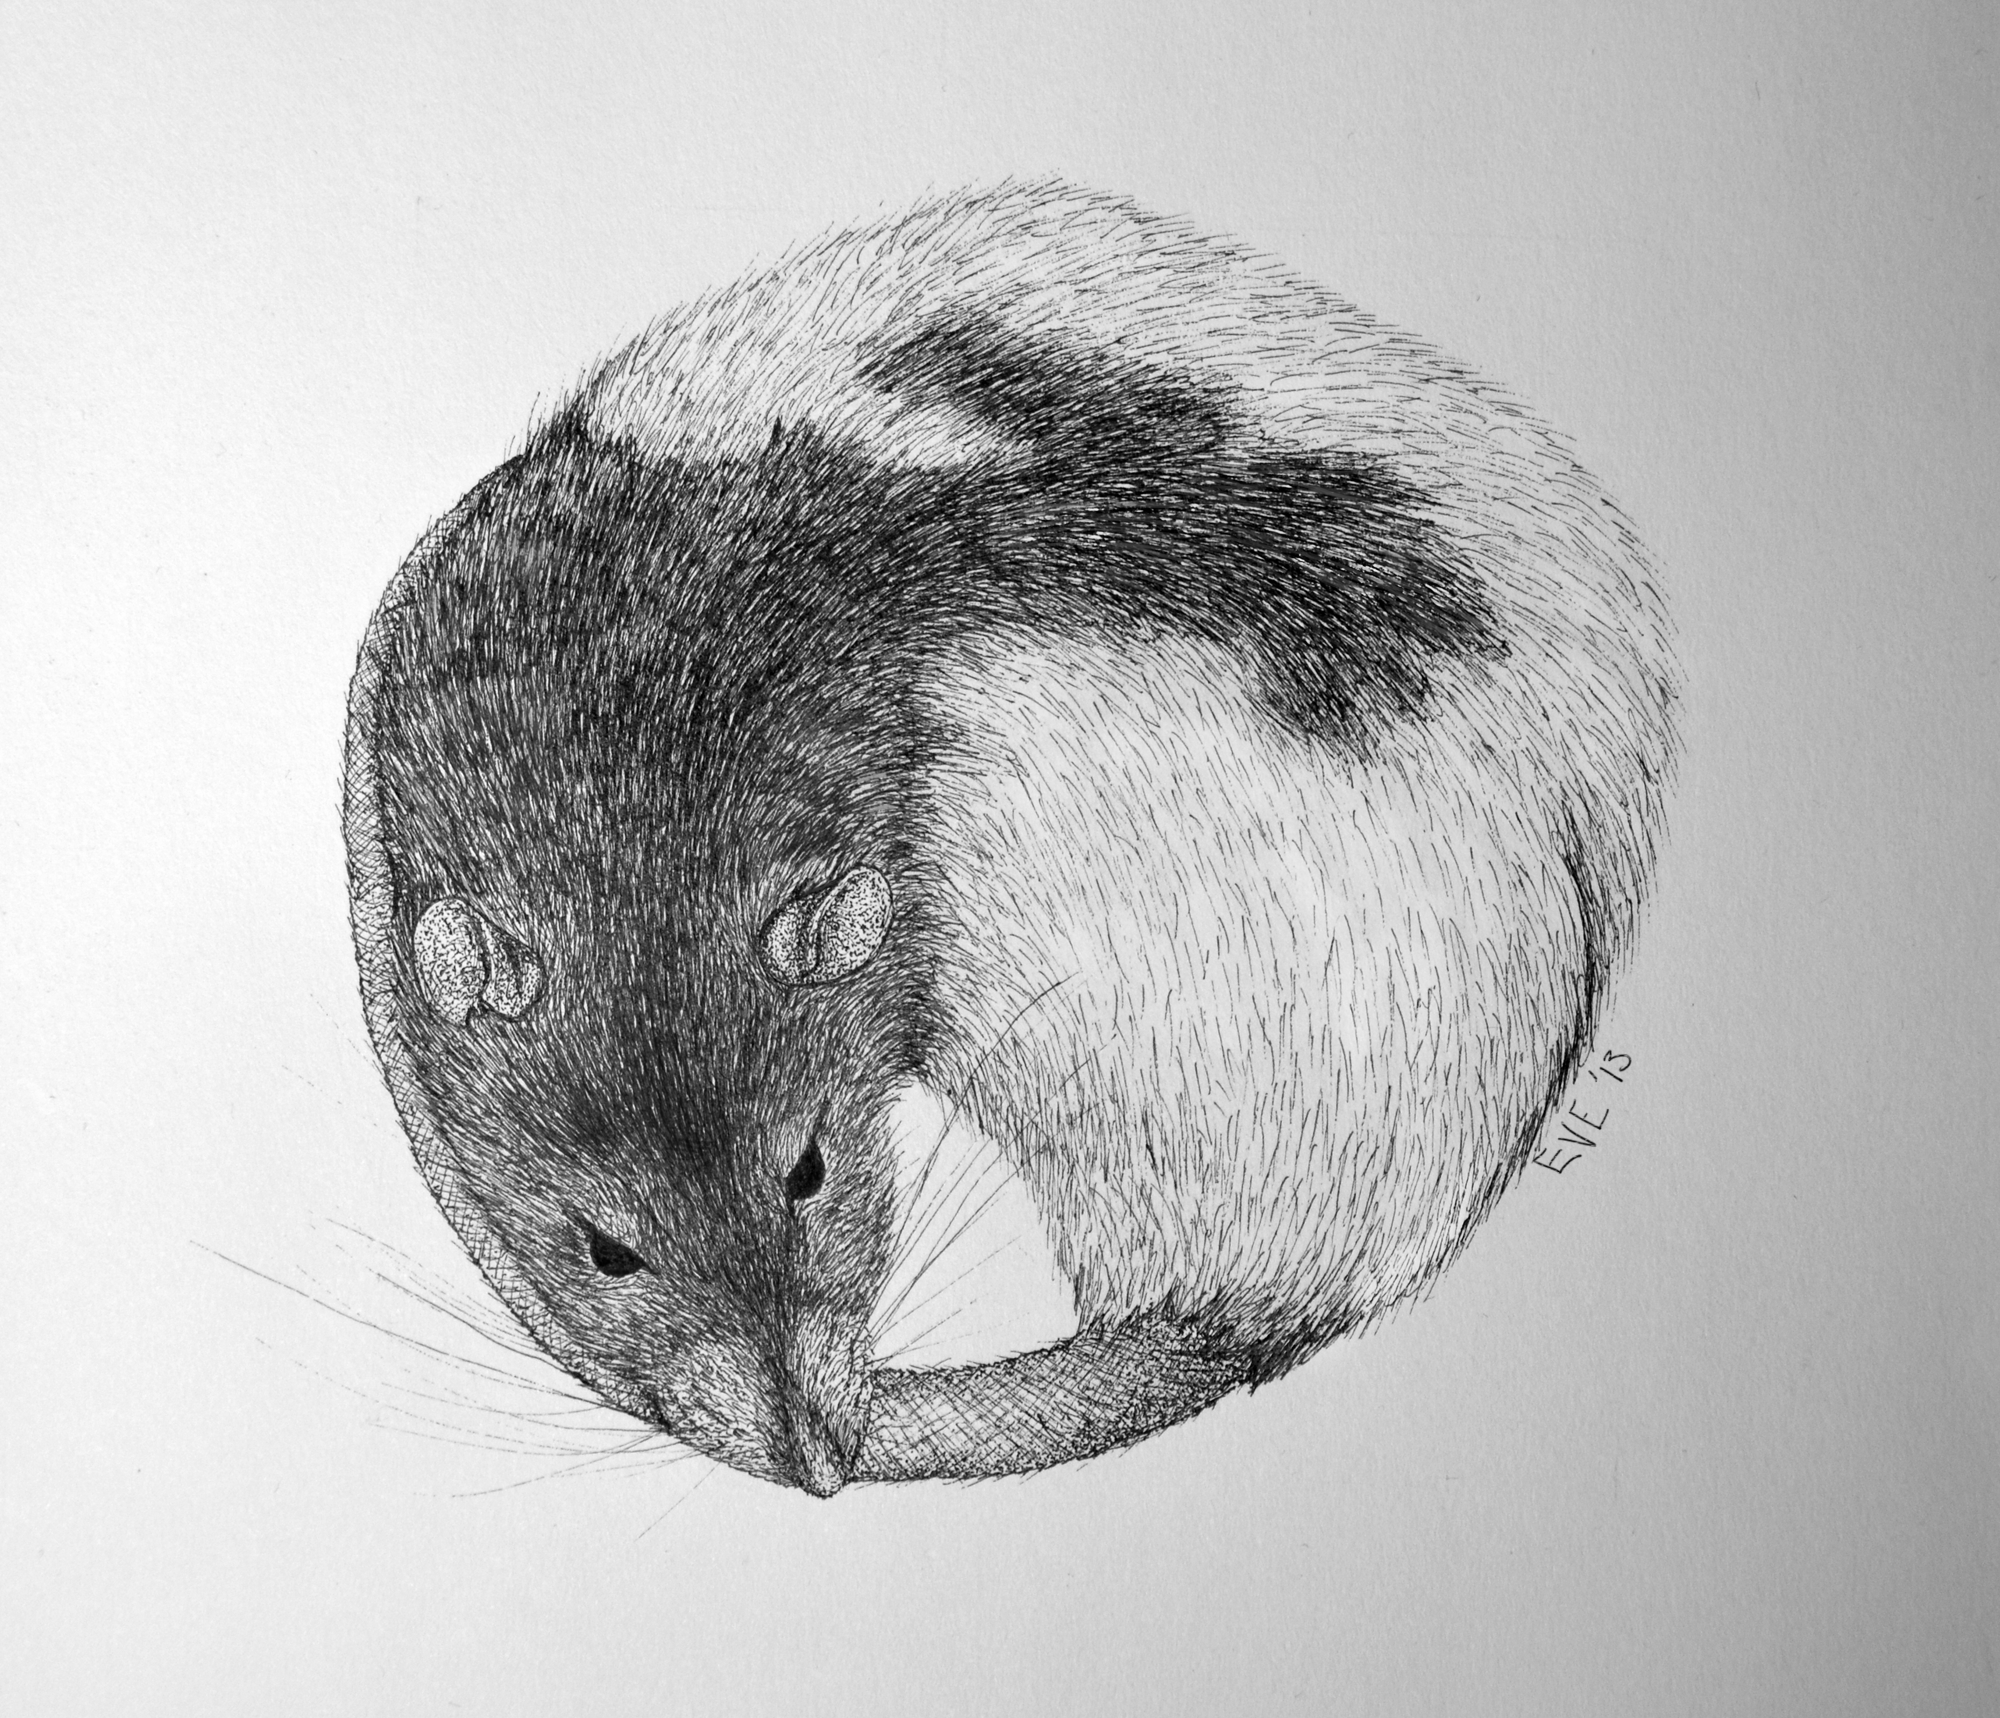 Sleepy Rattie by nEVEr-mor